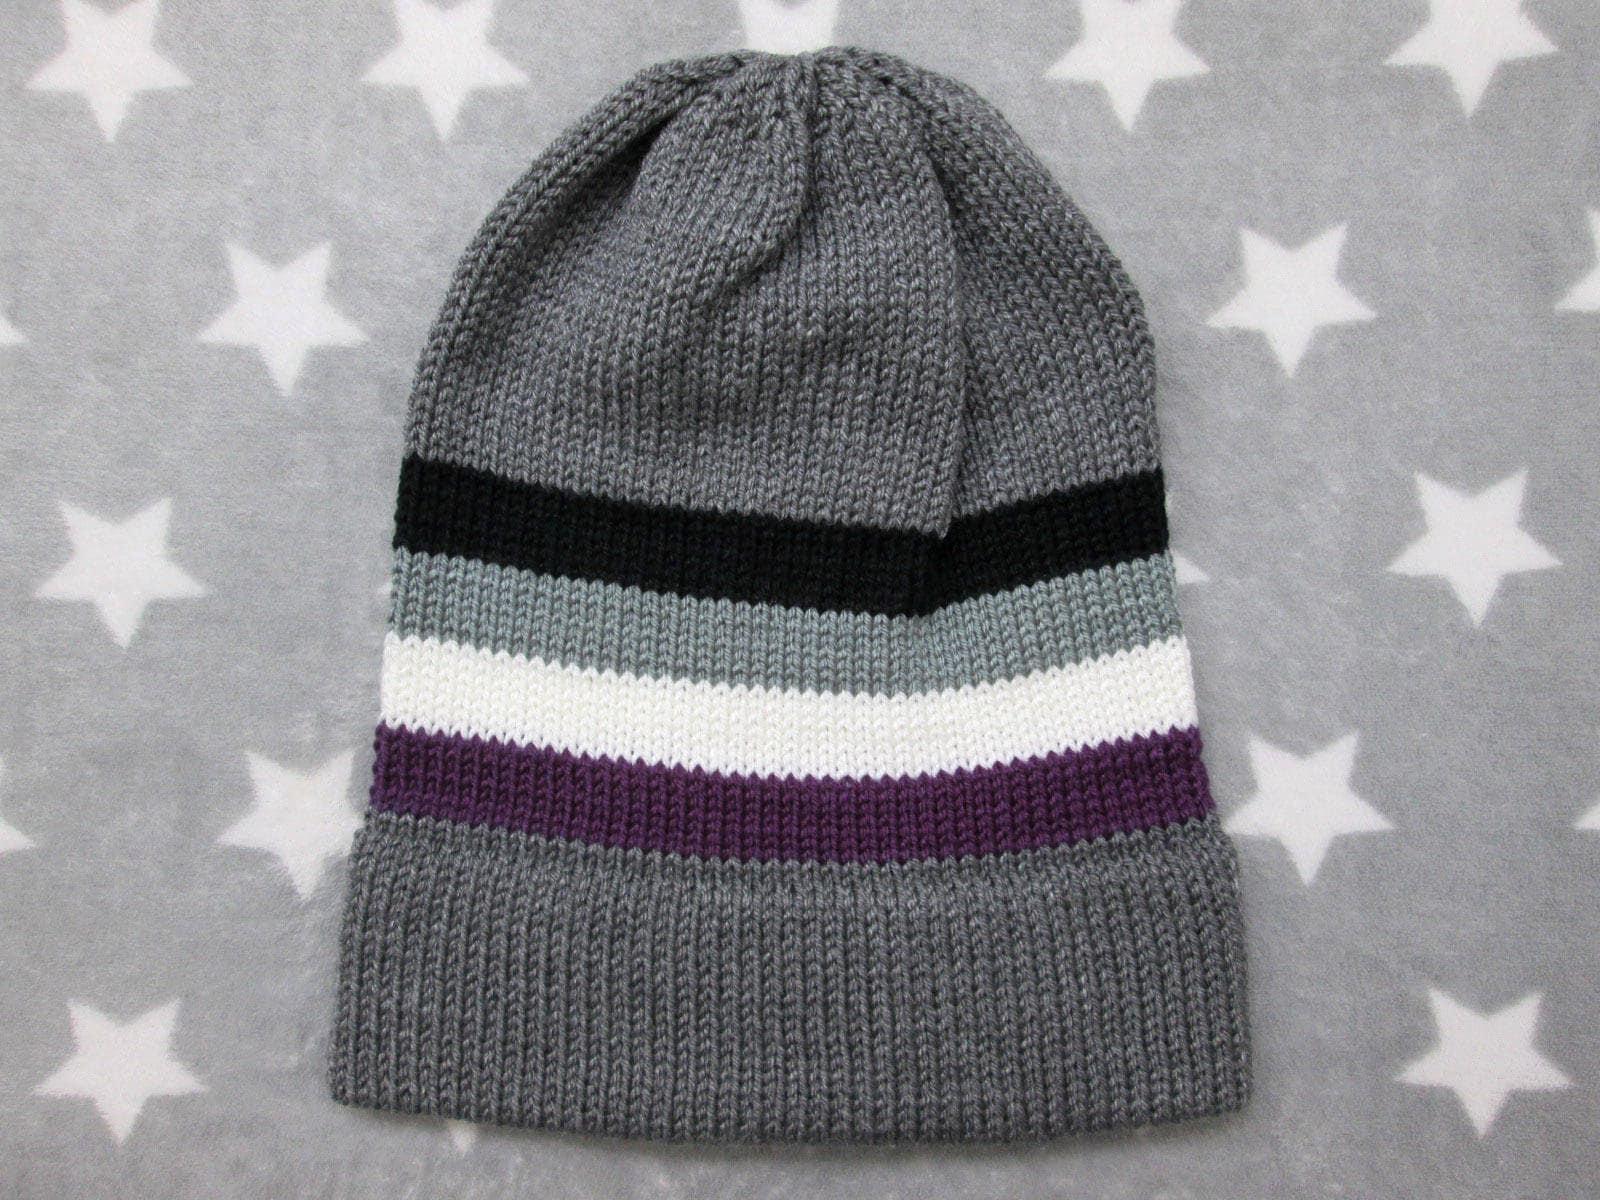 e833ffb7ad8 Knit Pride Hat - Ace Pride - Grey Slouchy Beanie - Grey Ace Pride